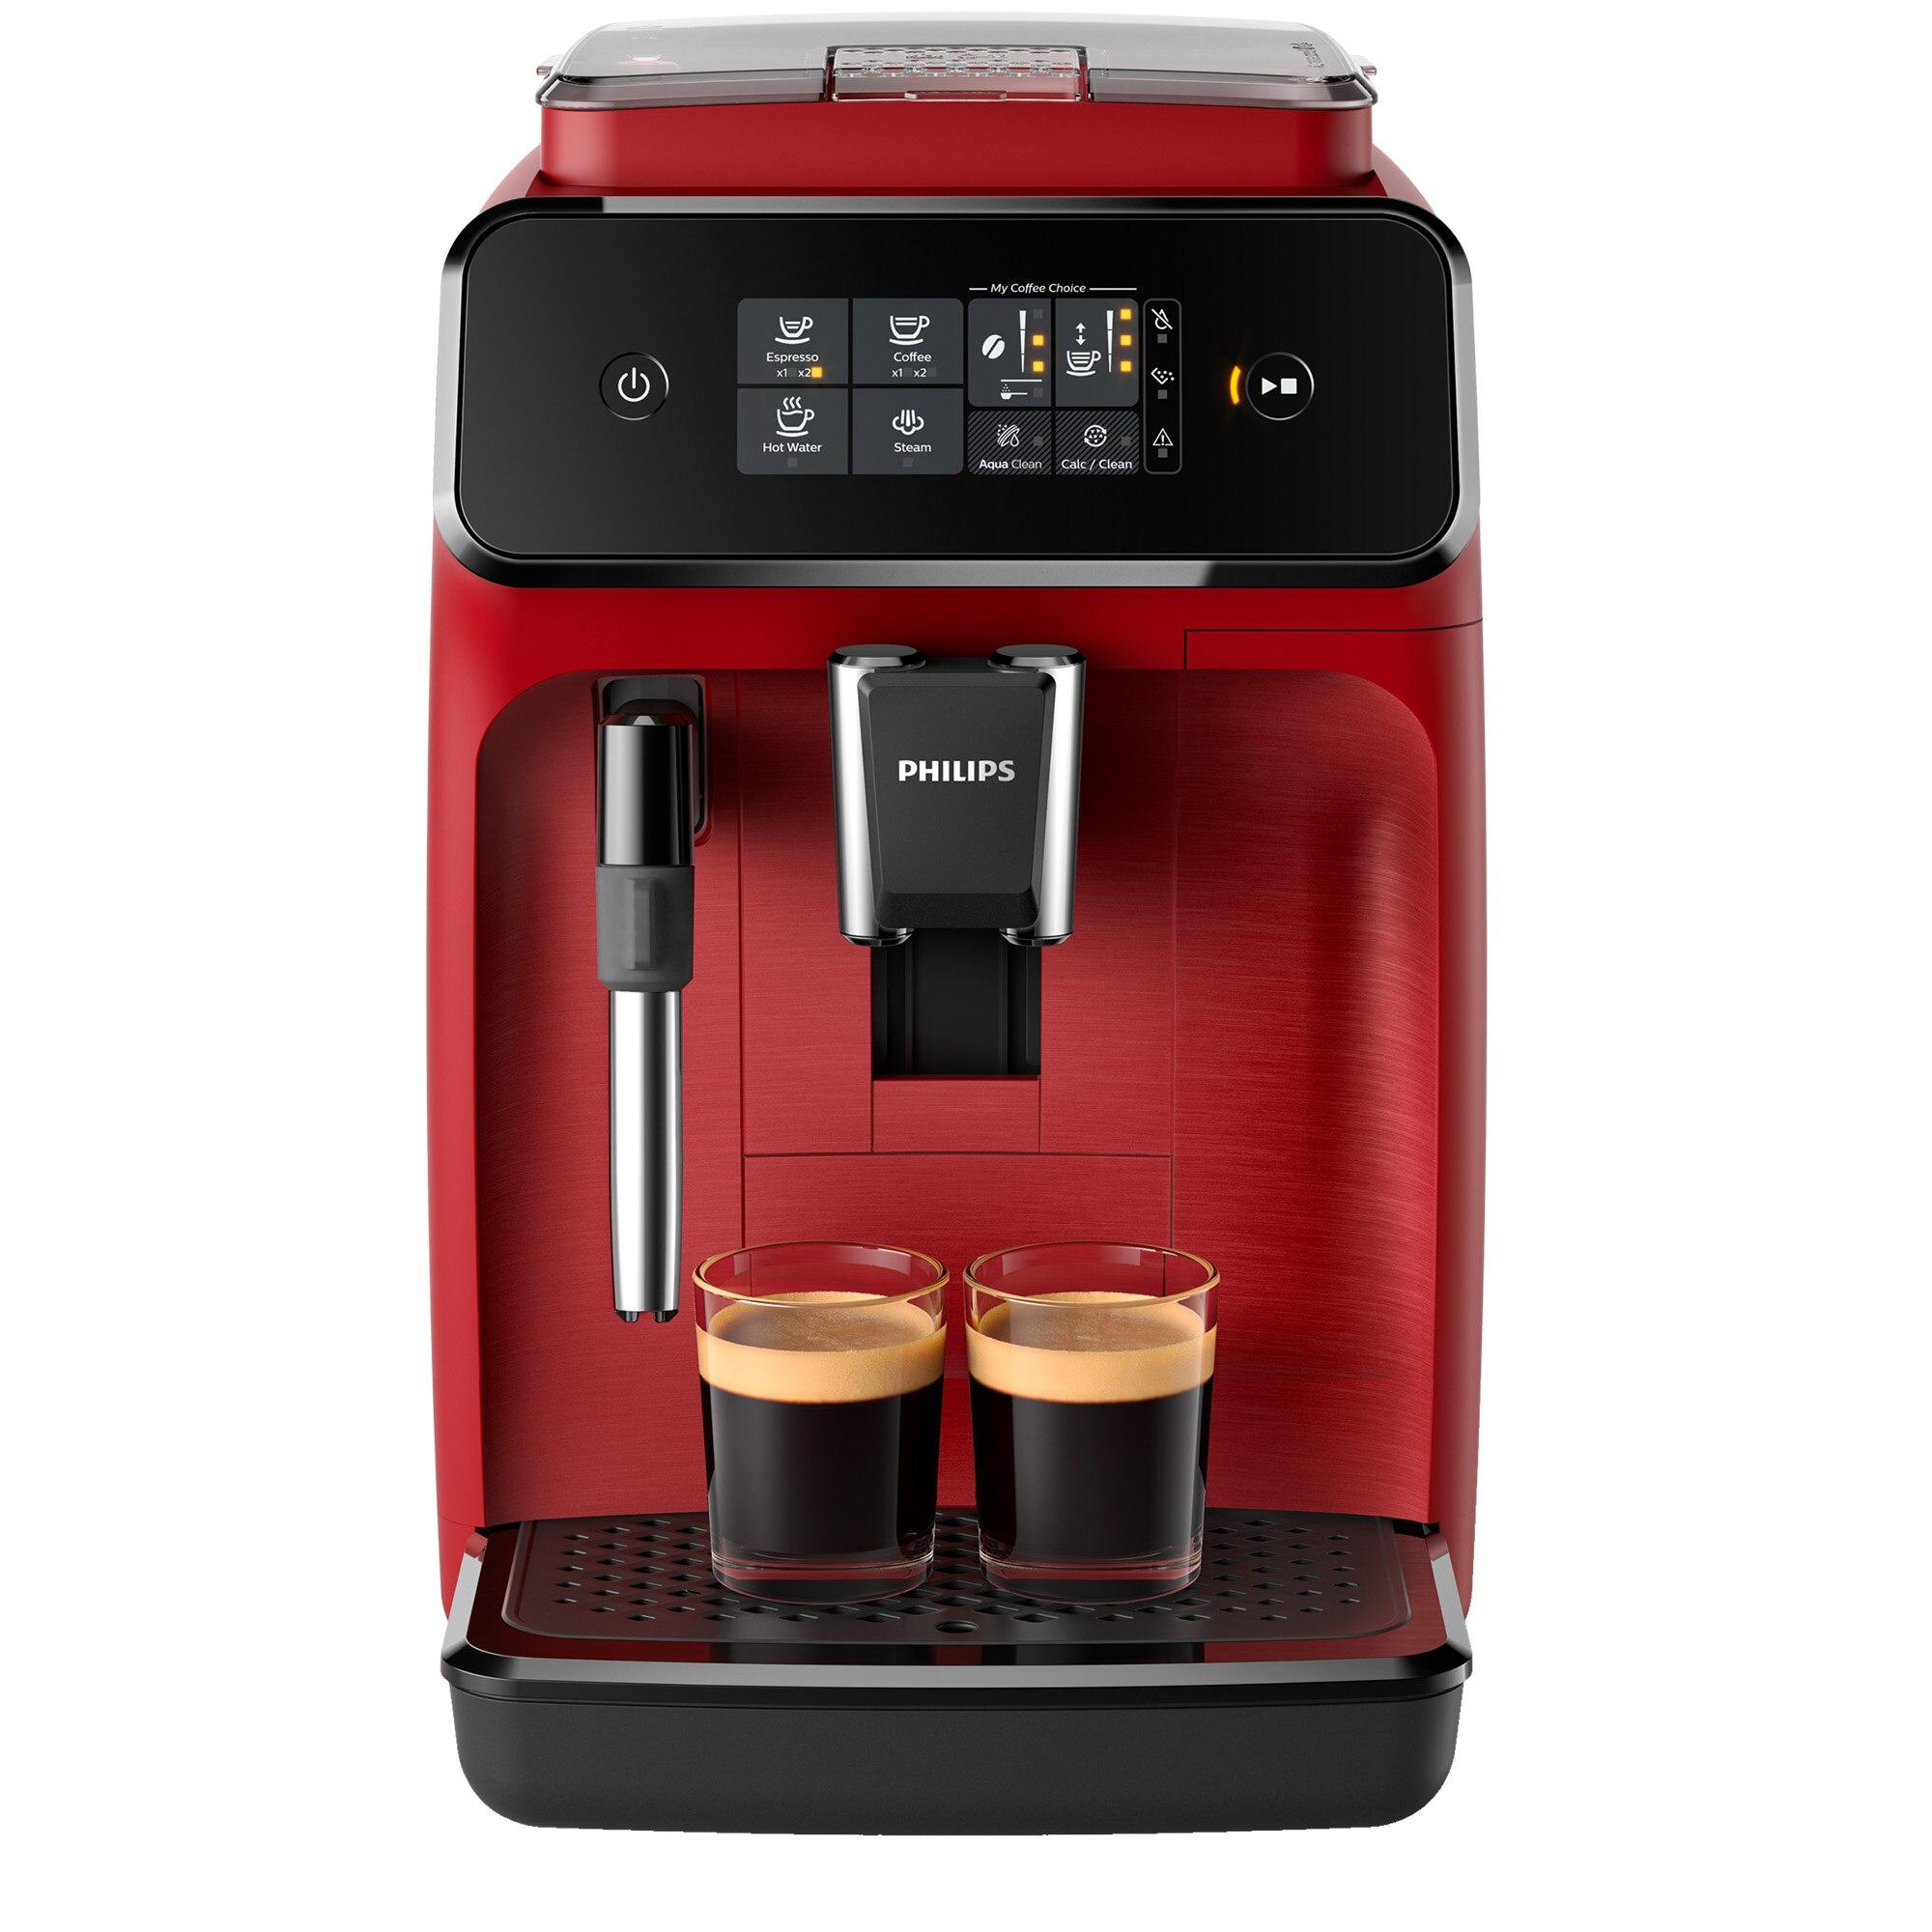 Fotografie Espressor automat Philips EP1222/00 Seria 1200, sistem clasic de spumare, 2 bauturi, optiune 2 cesti, 12 setari macinare, rasnita ceramica, Rosu